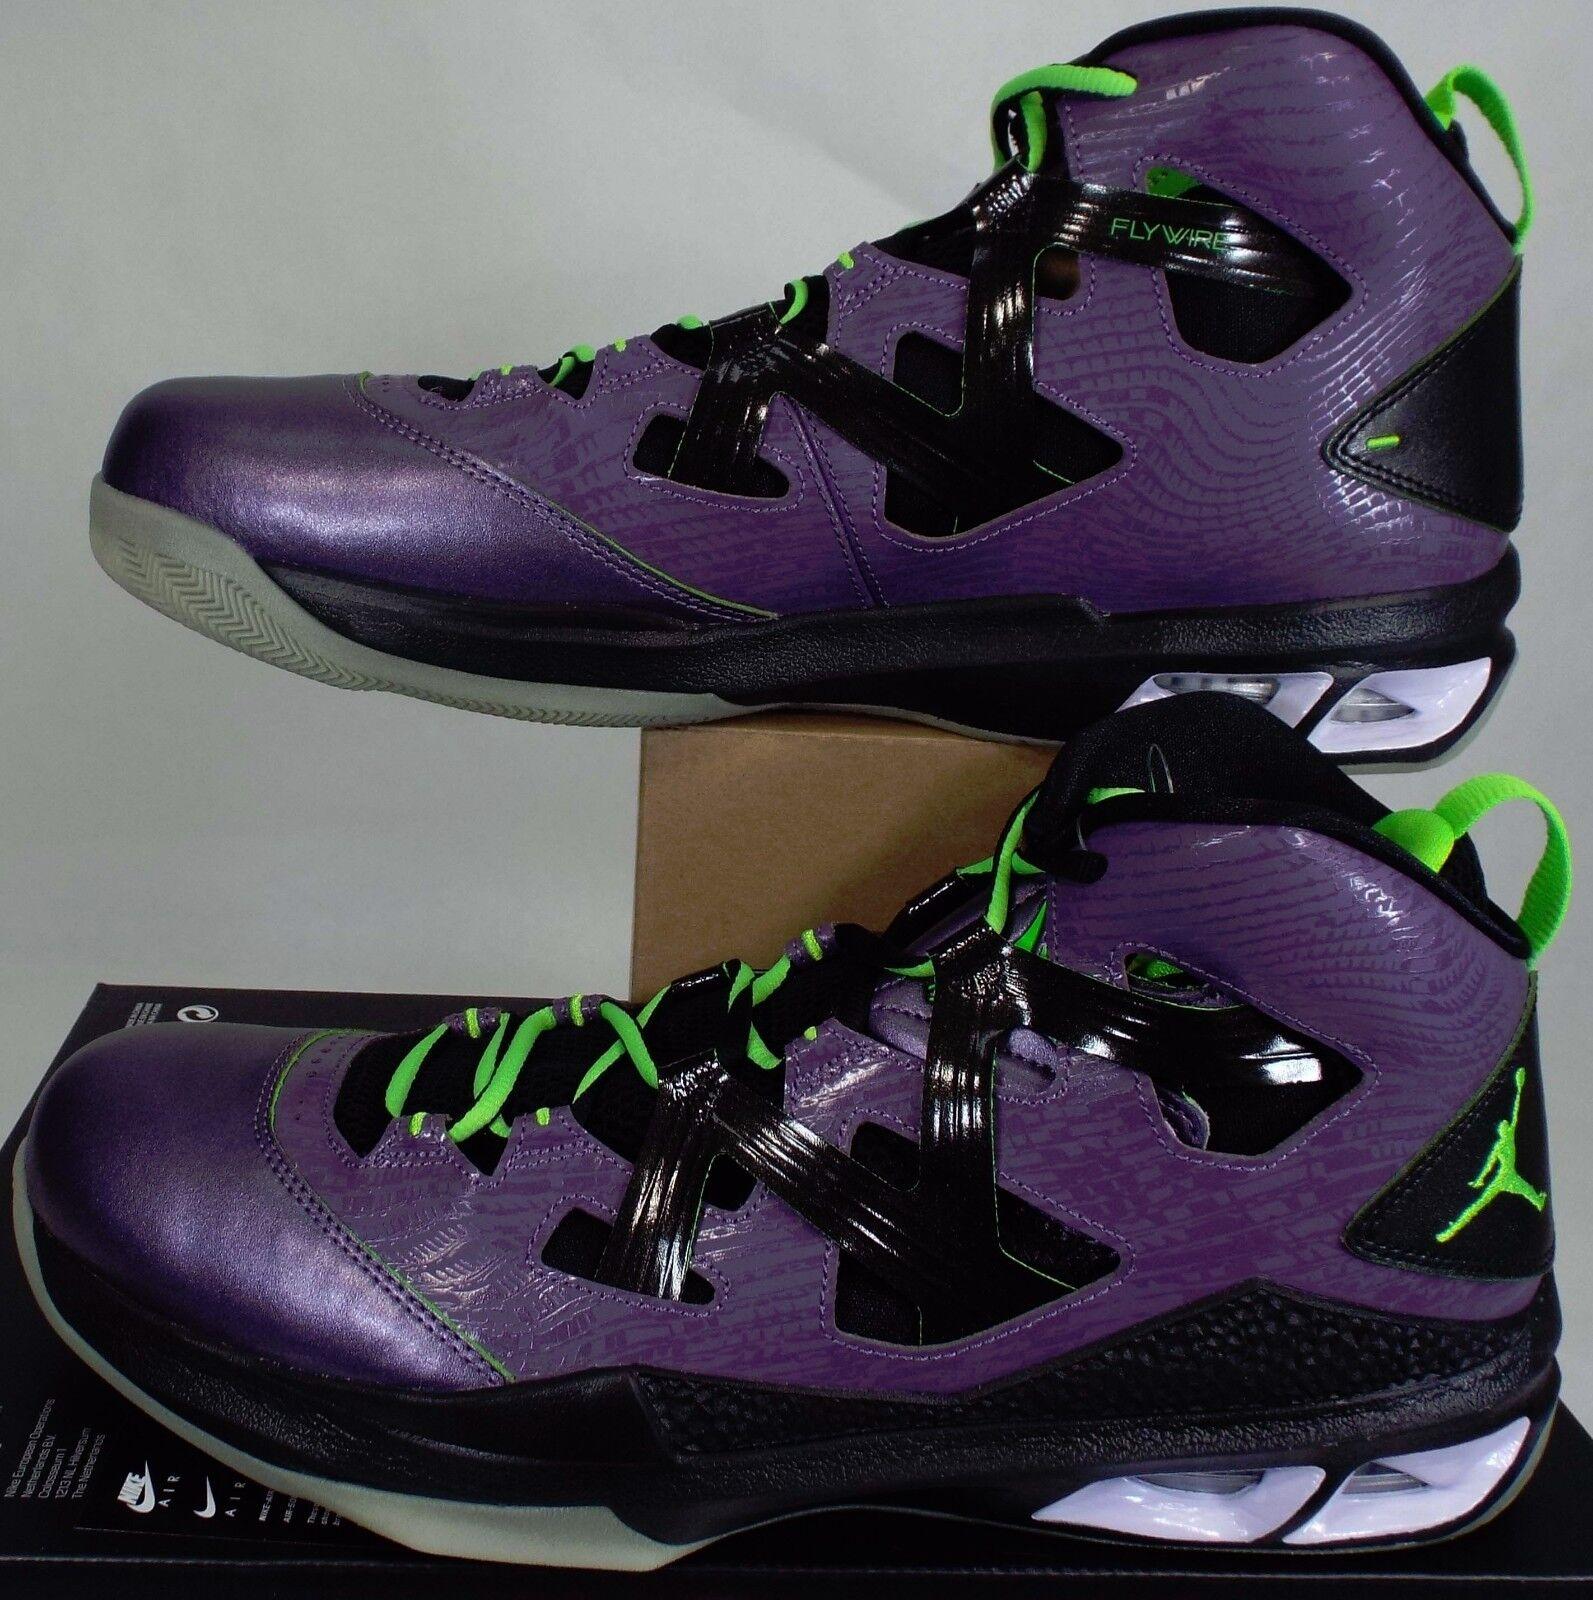 New Hommes 13 NIKE Air Jordan Melo M9 BLKLGT Violet  Noir  Chaussures  140 587858-539